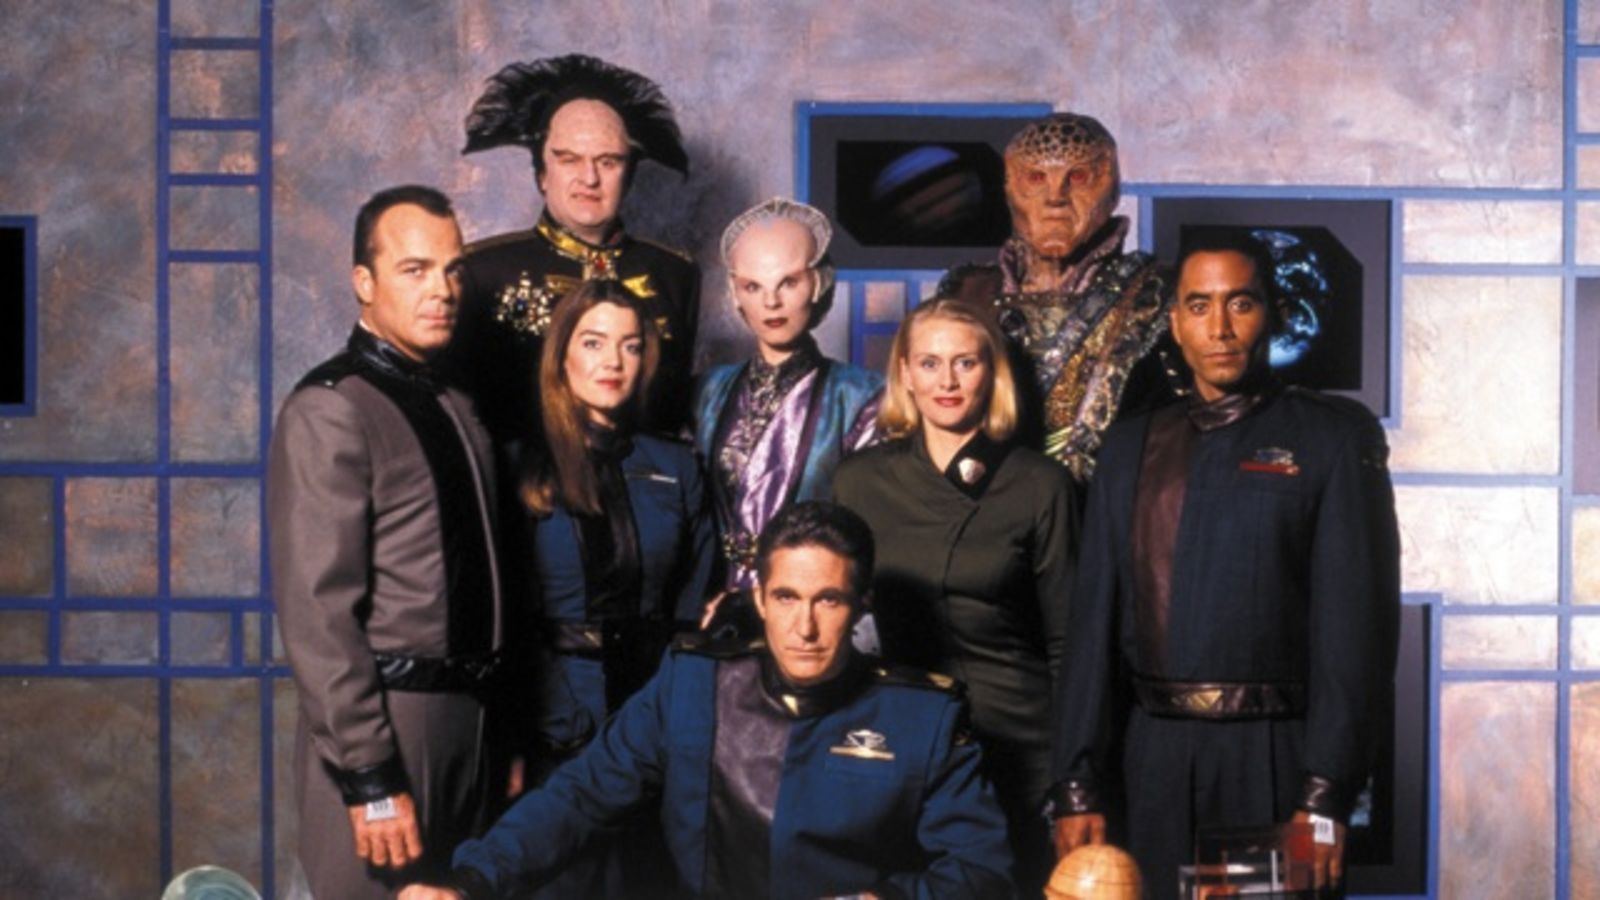 The season 1 cast of Babylon 5